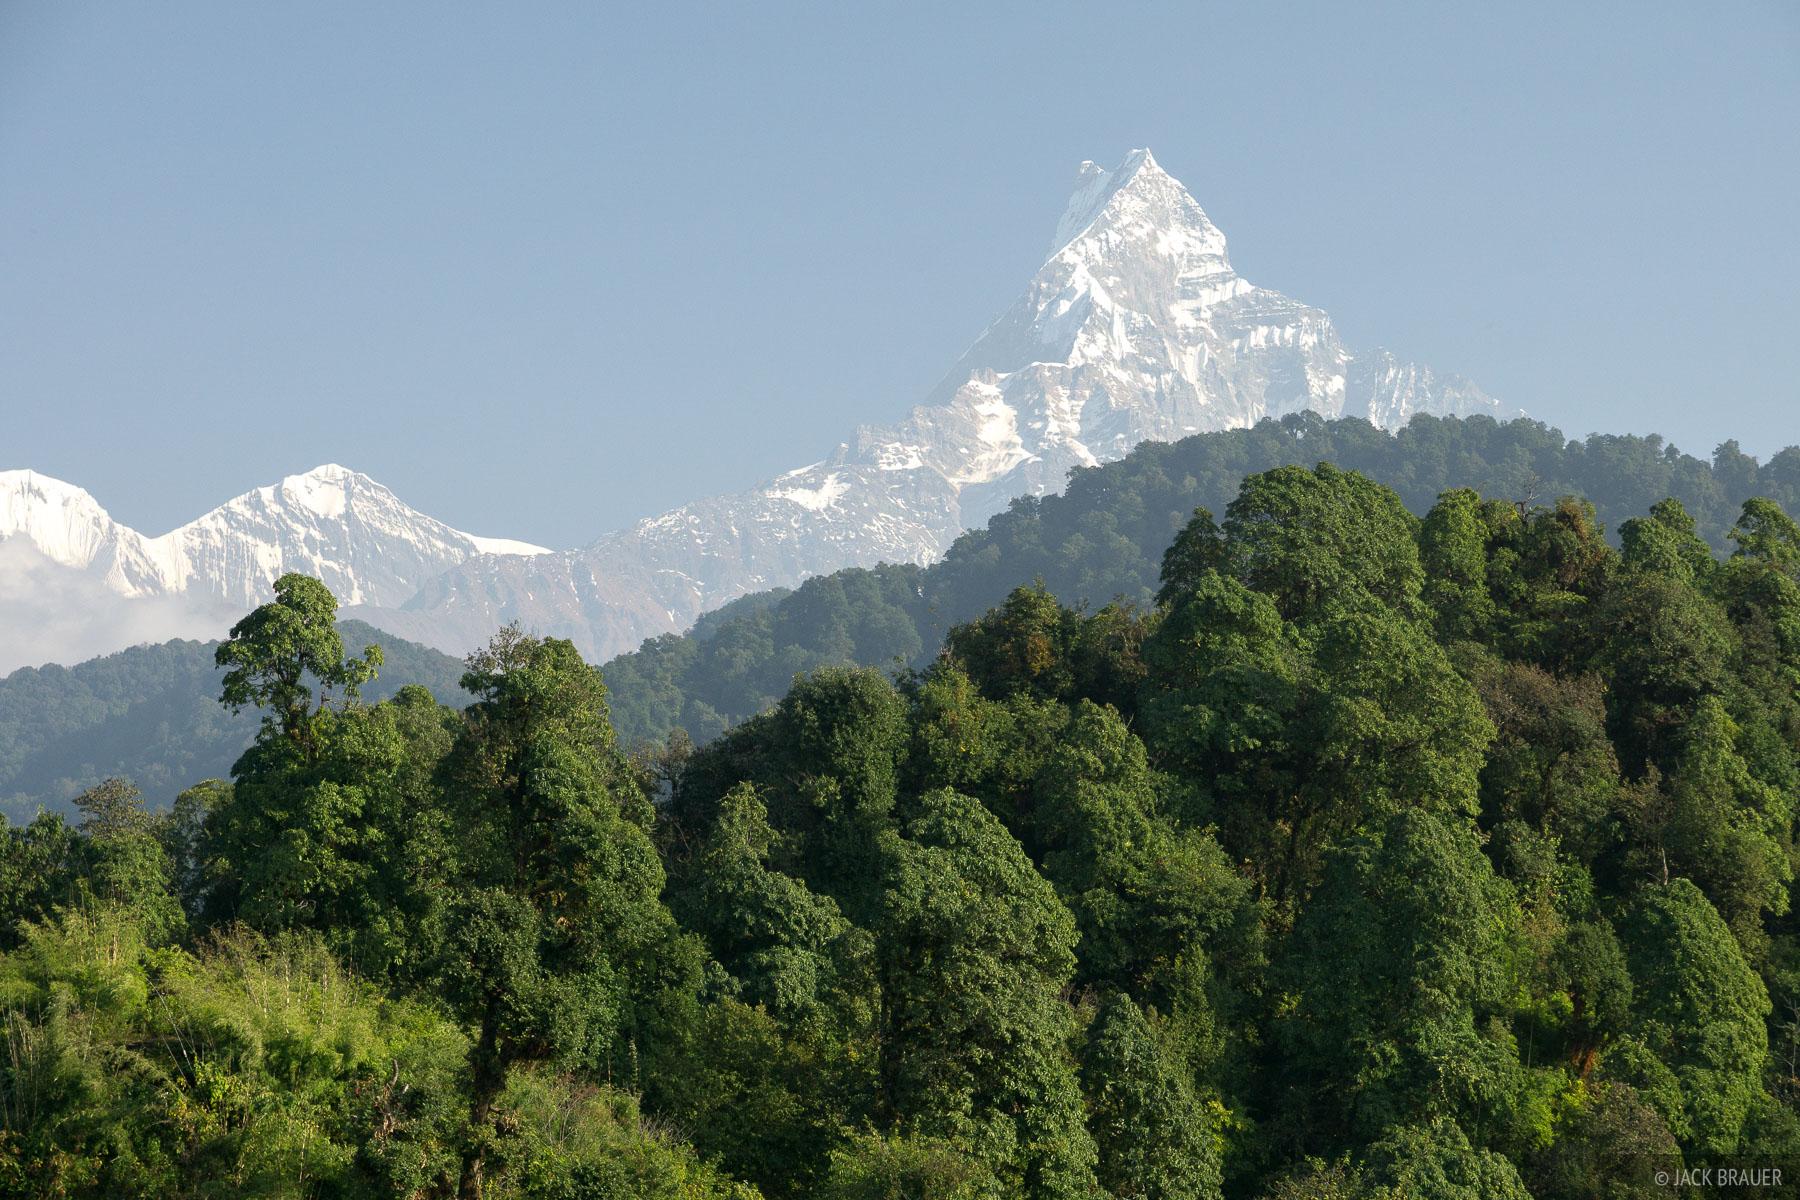 Machhapuchhre (6993m / 22,943 ft.)